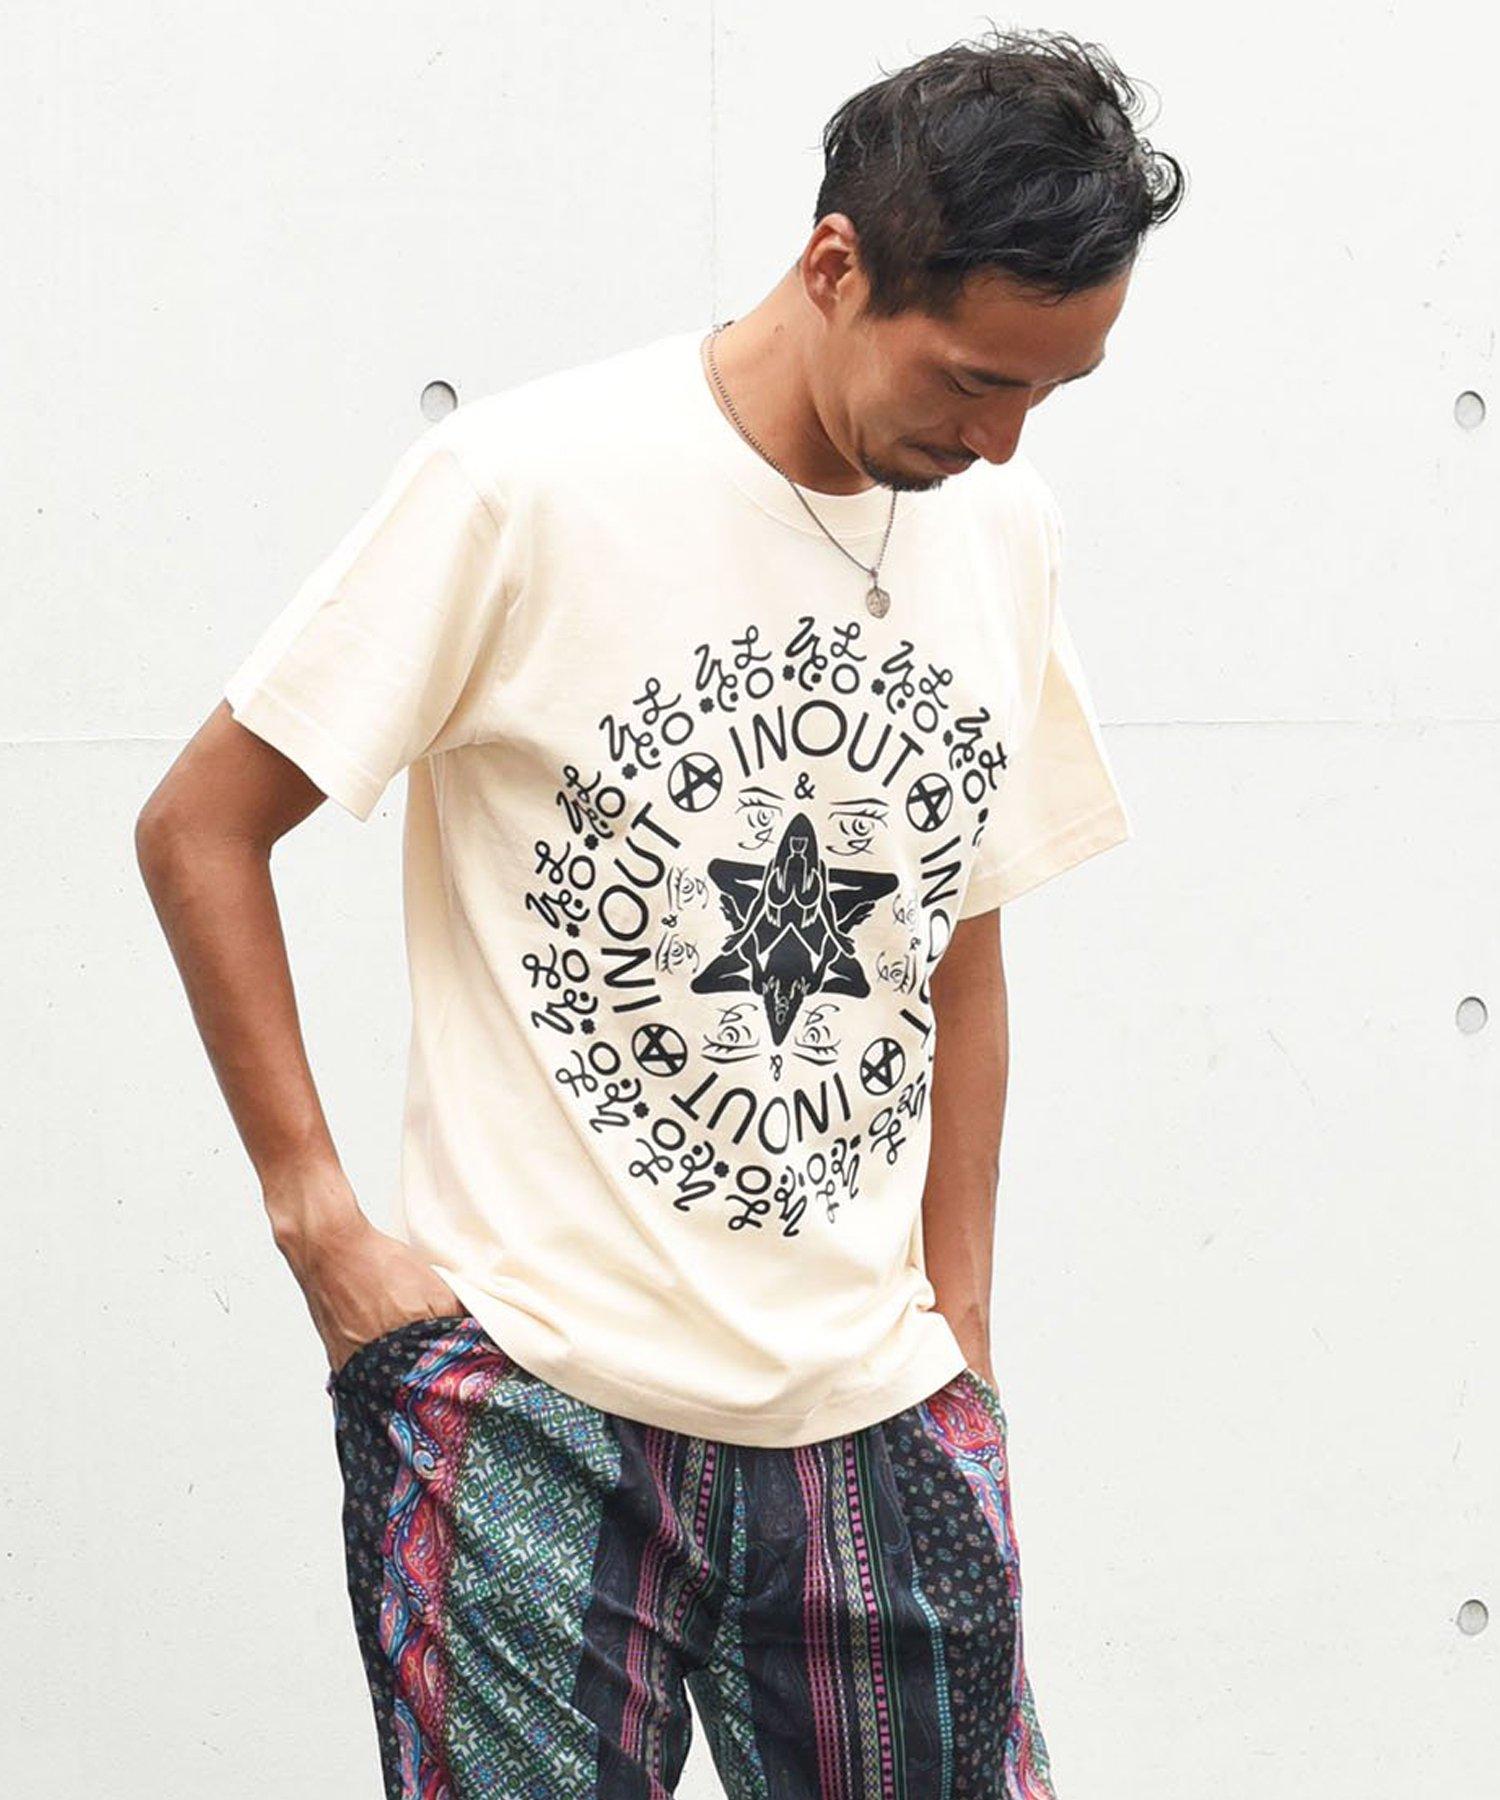 ARIGATO FAKKYU - アリガトファッキュ 愛にまつわるオリジナルグラフィックを一堂に介した手刷りTee / NATURAL